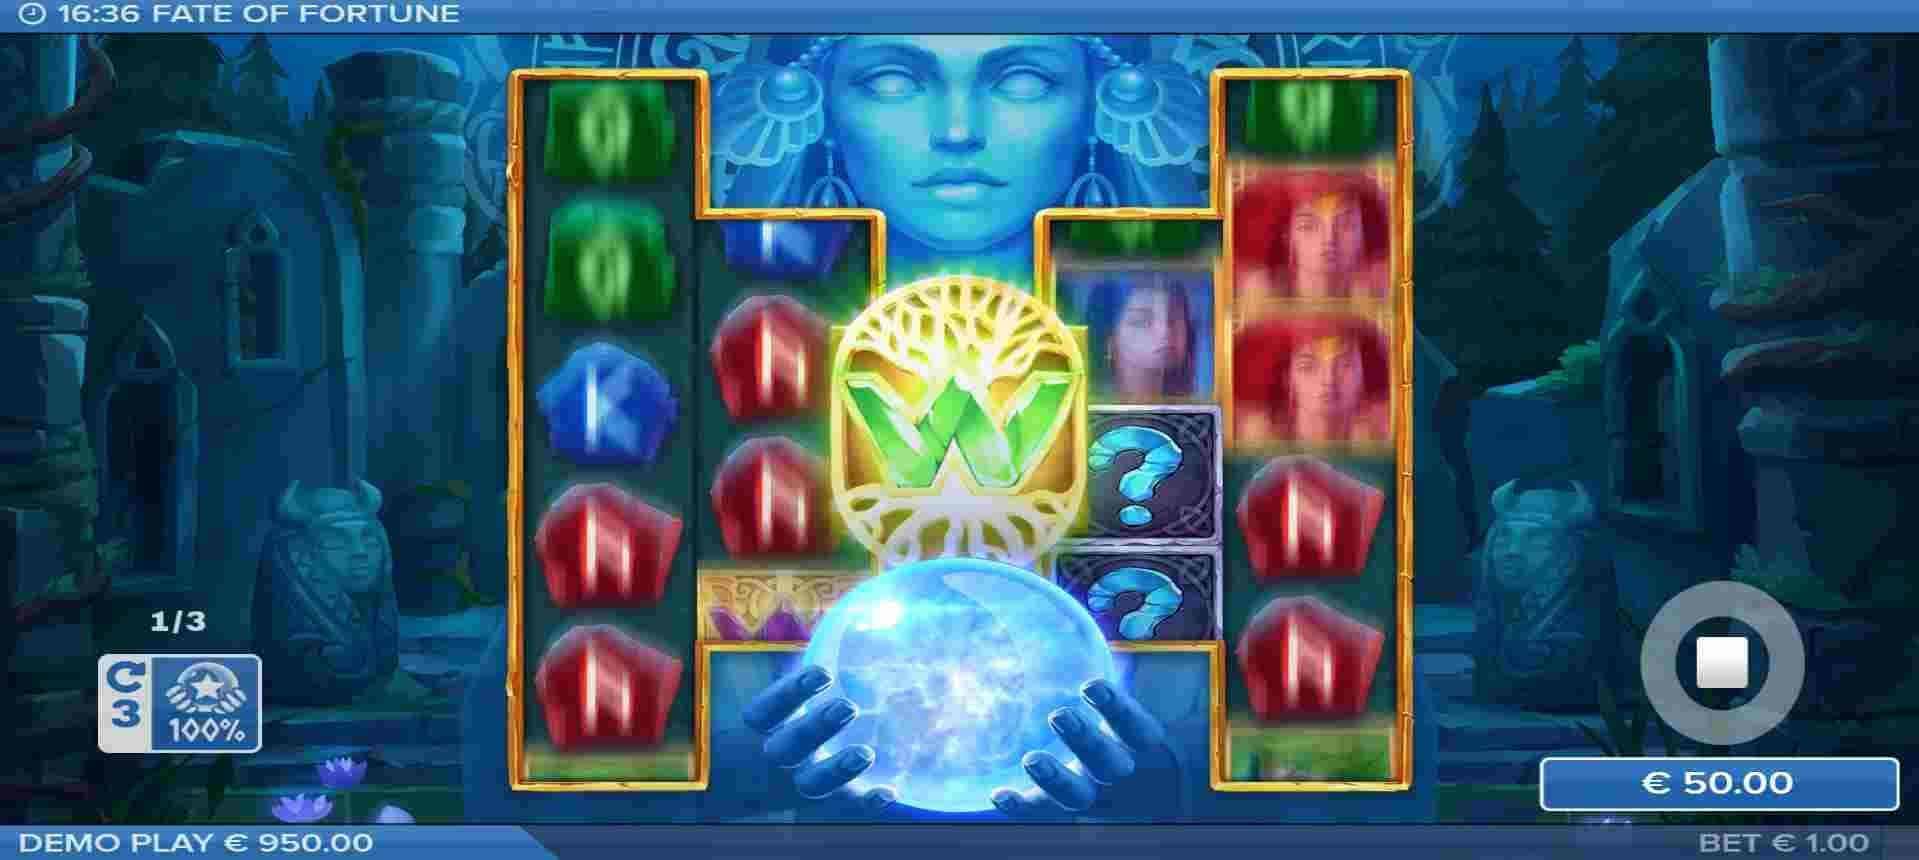 Fate of Fortune Slot Fortune's Favor